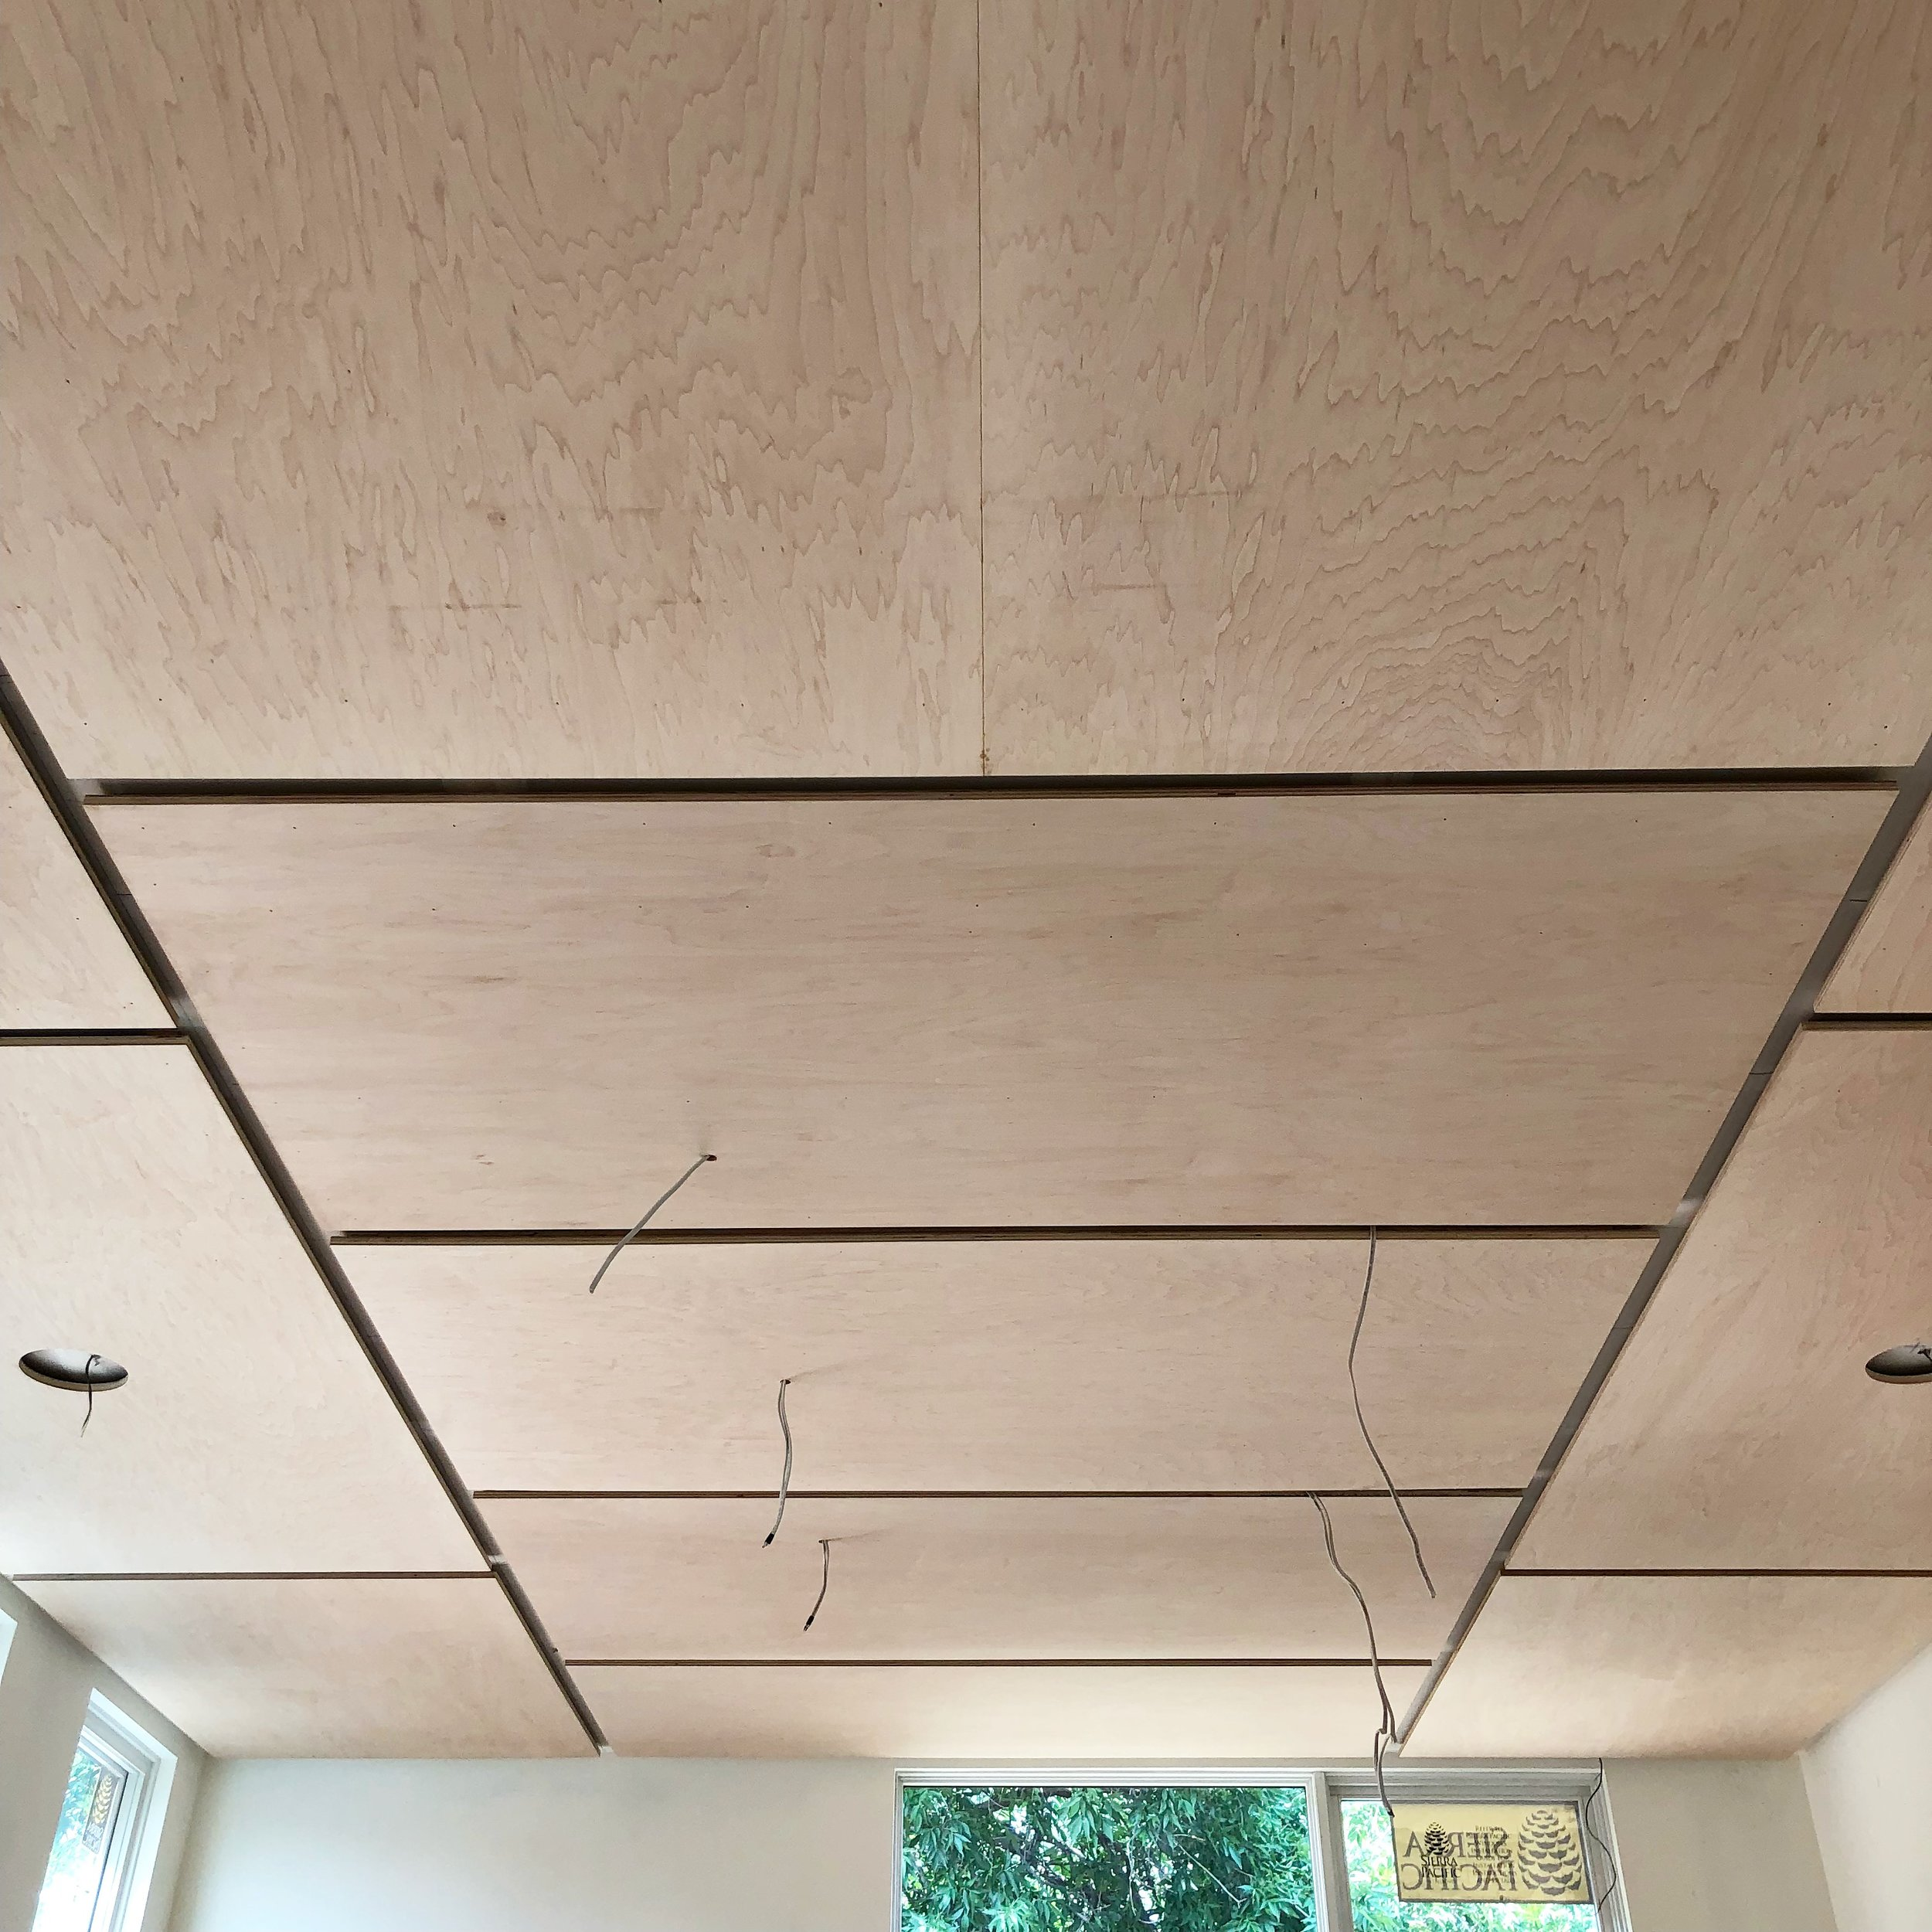 CN interior ceiling panels 01.JPG